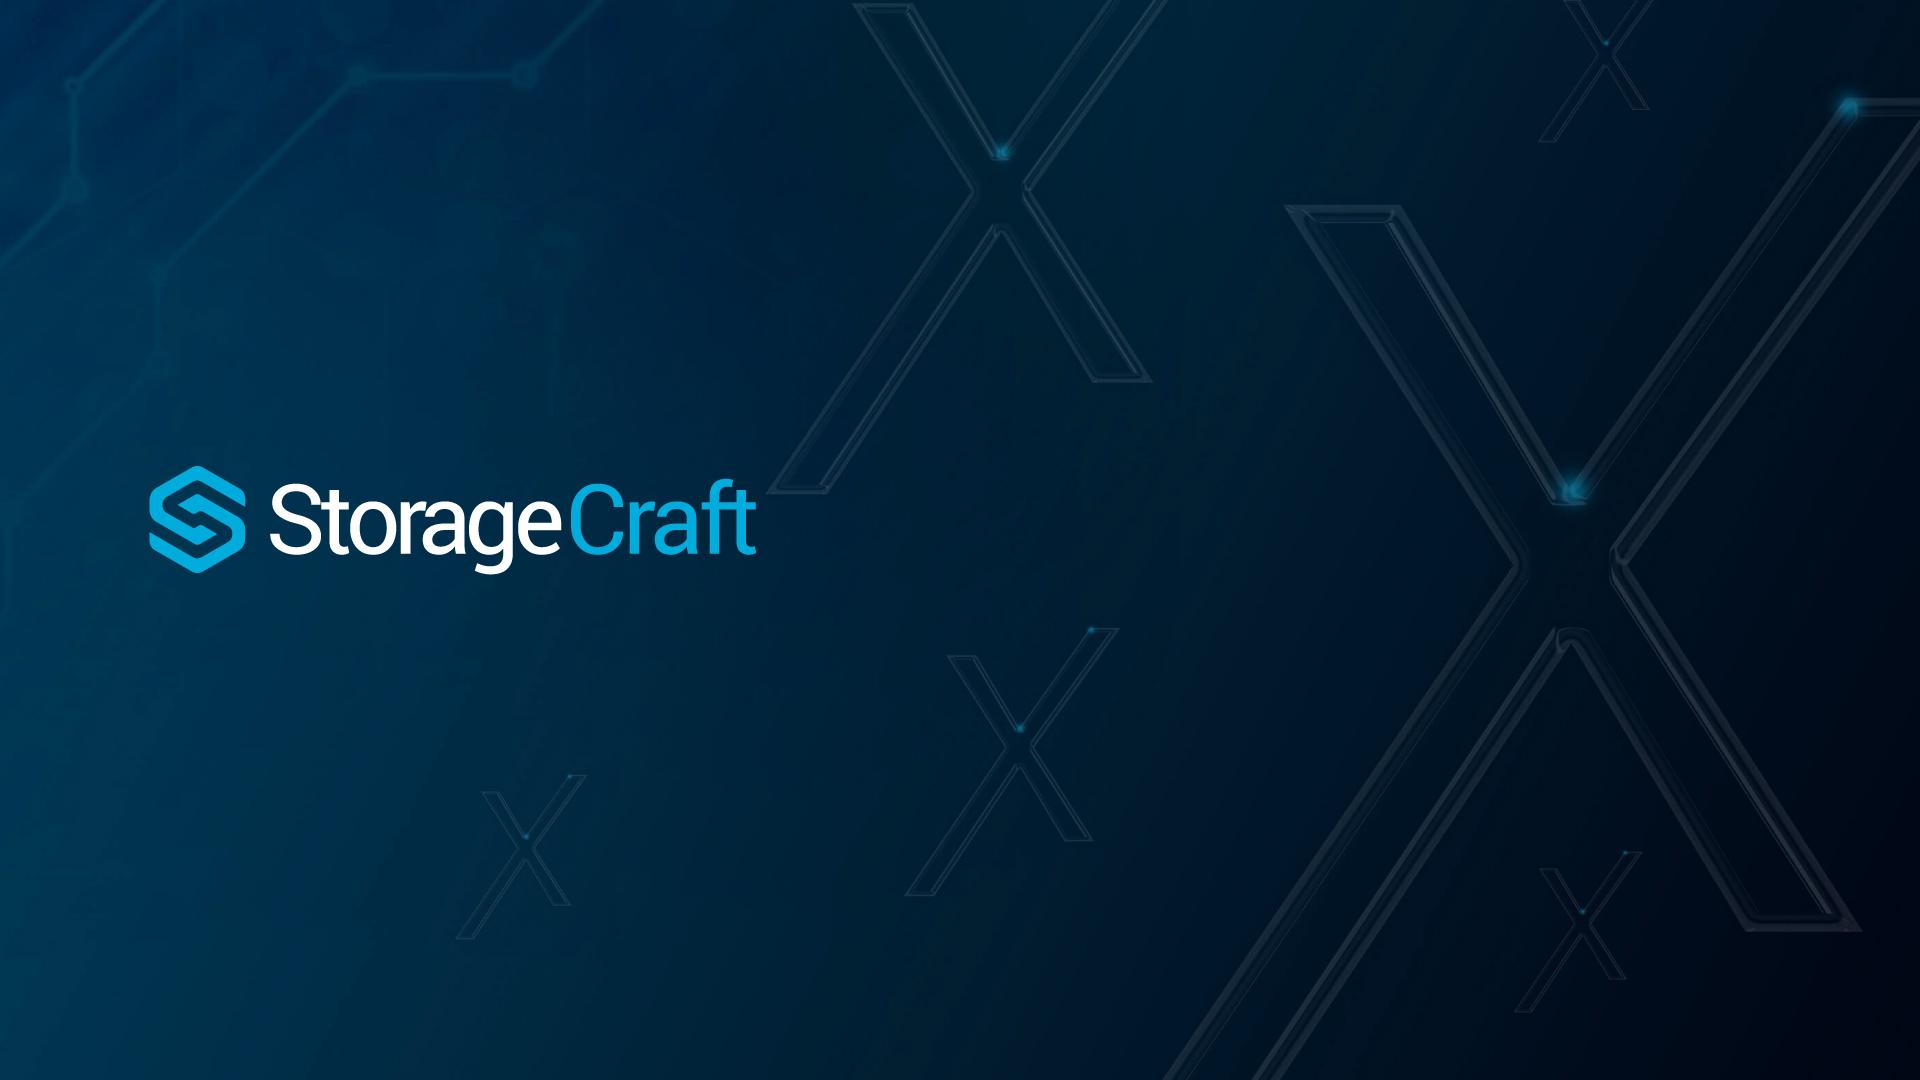 y2mate.com - StorageCraft ShadowXafe_zSwtD7PRsys_1080p